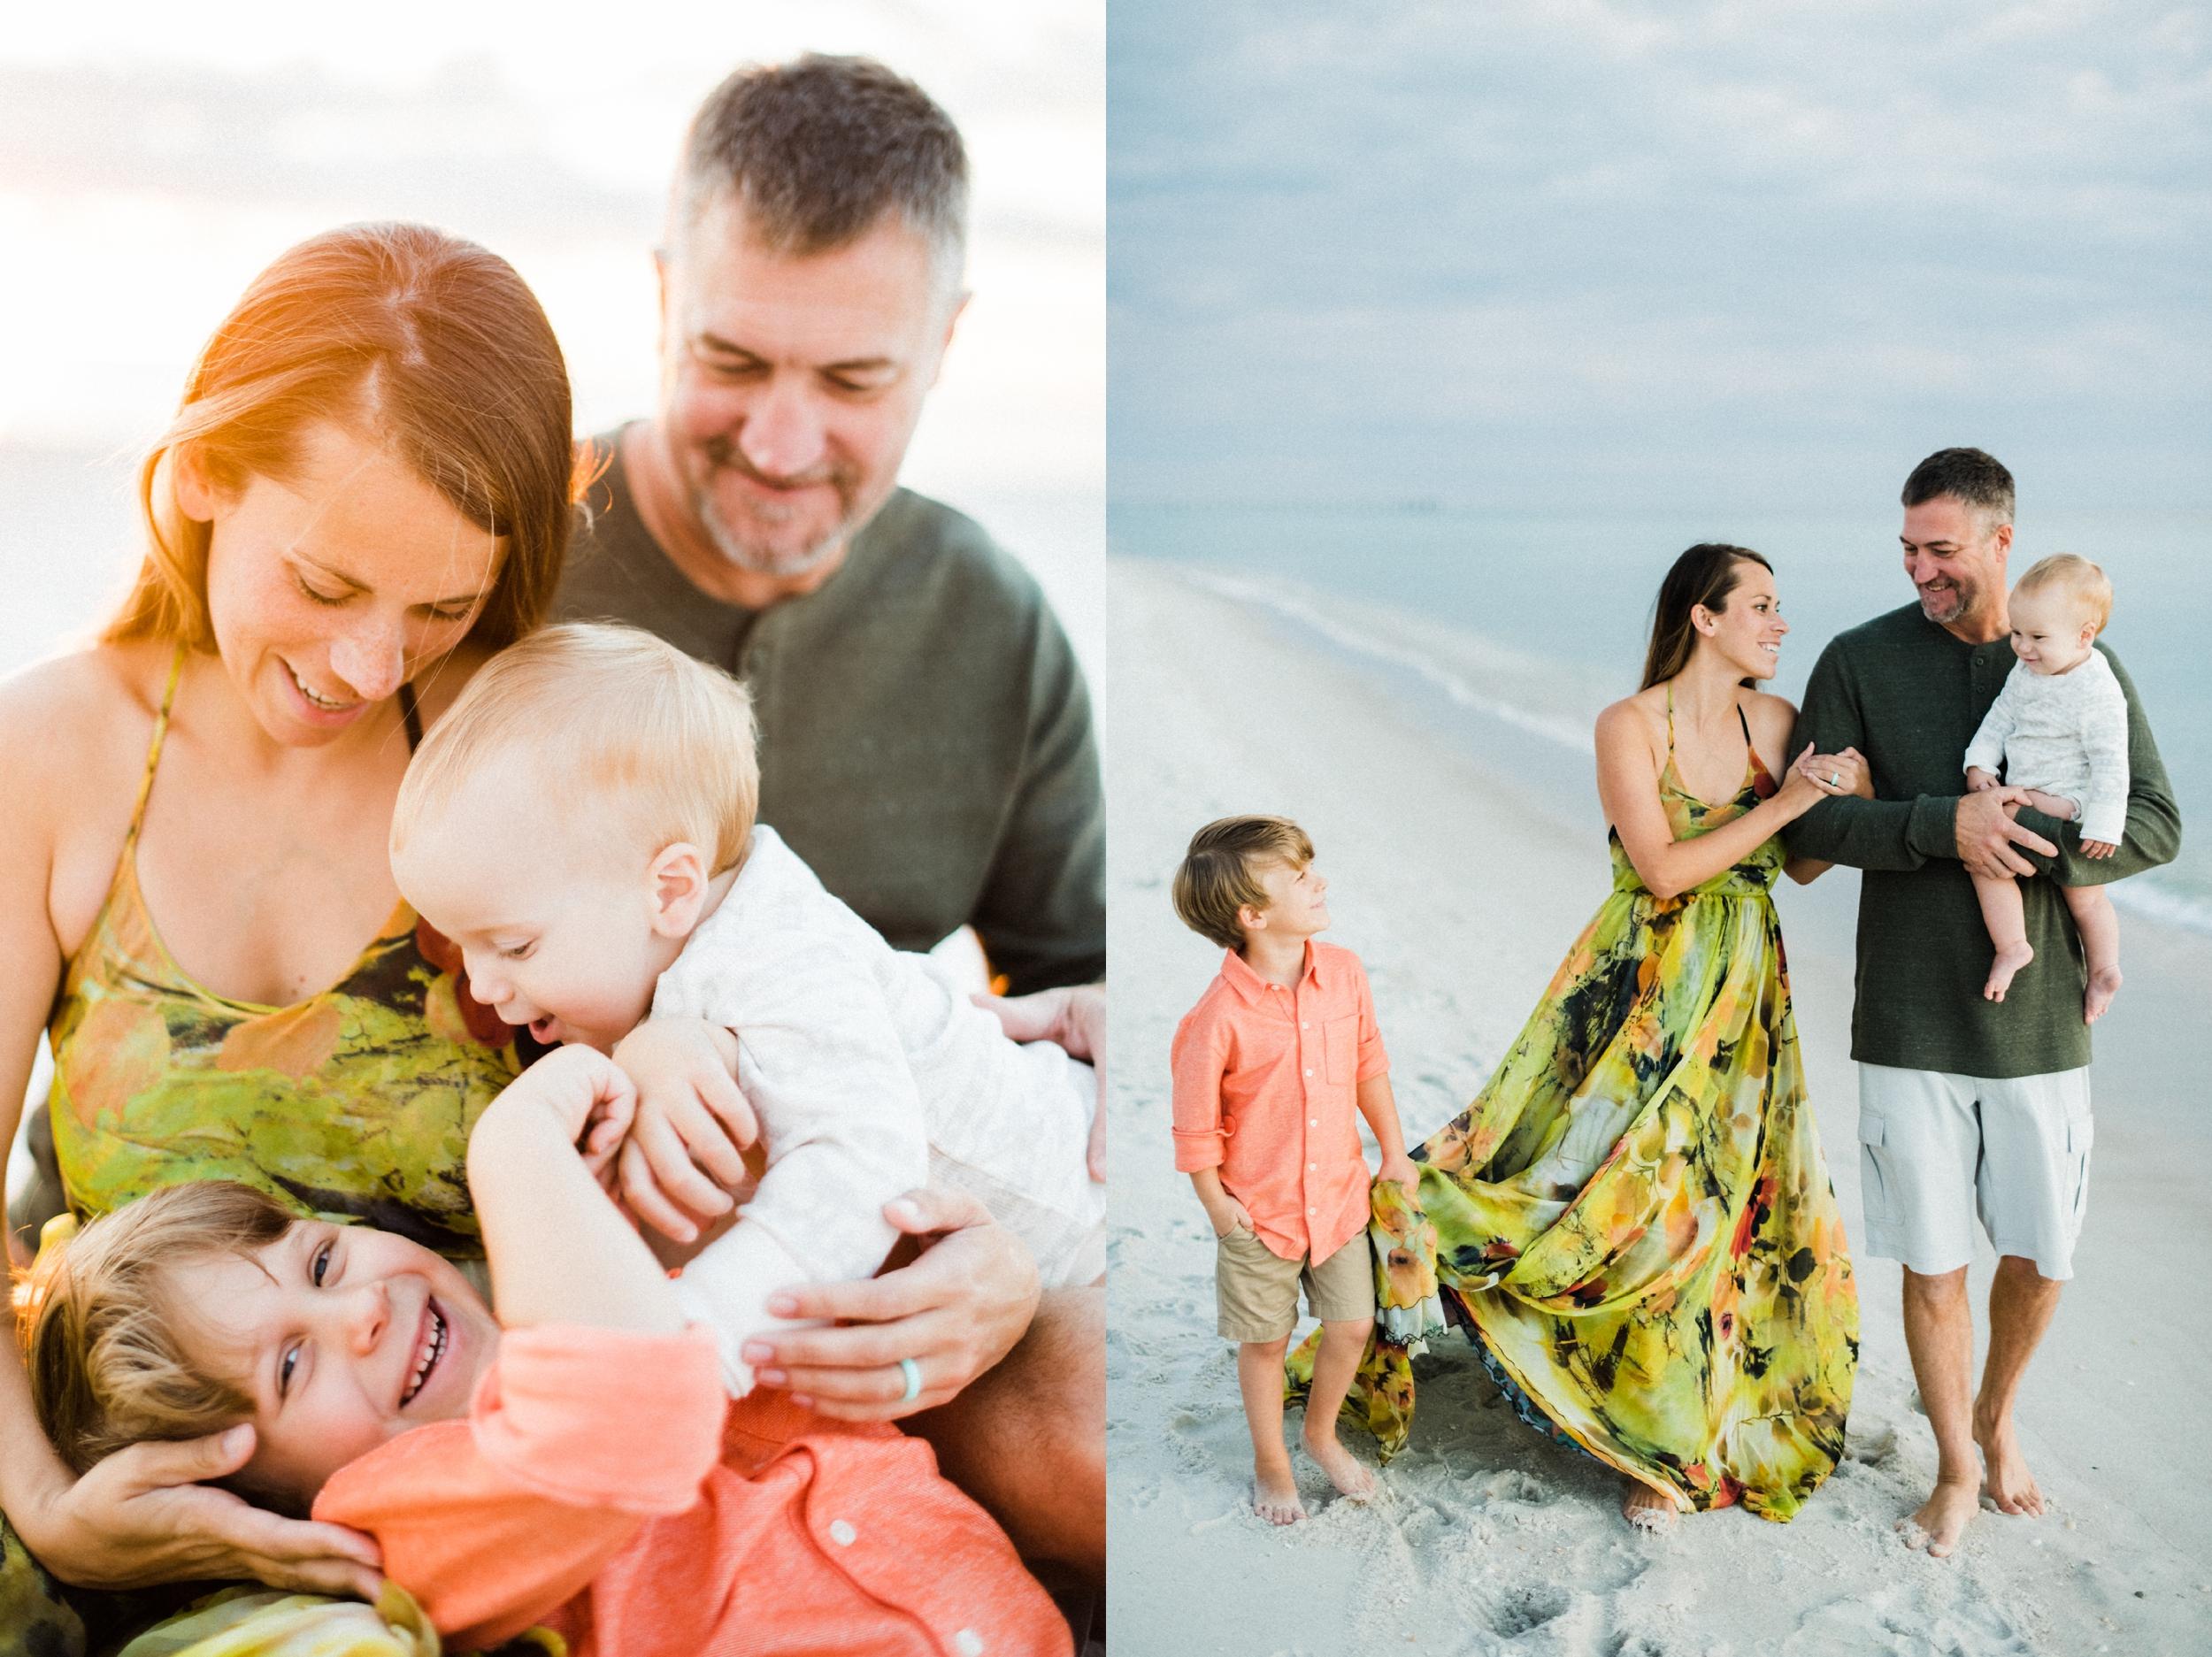 desiree-gardner-photography-pairs-france-monet-garden-monets-couple-wedding-engagement-giverny-30-a-30a-florida_0082.jpg